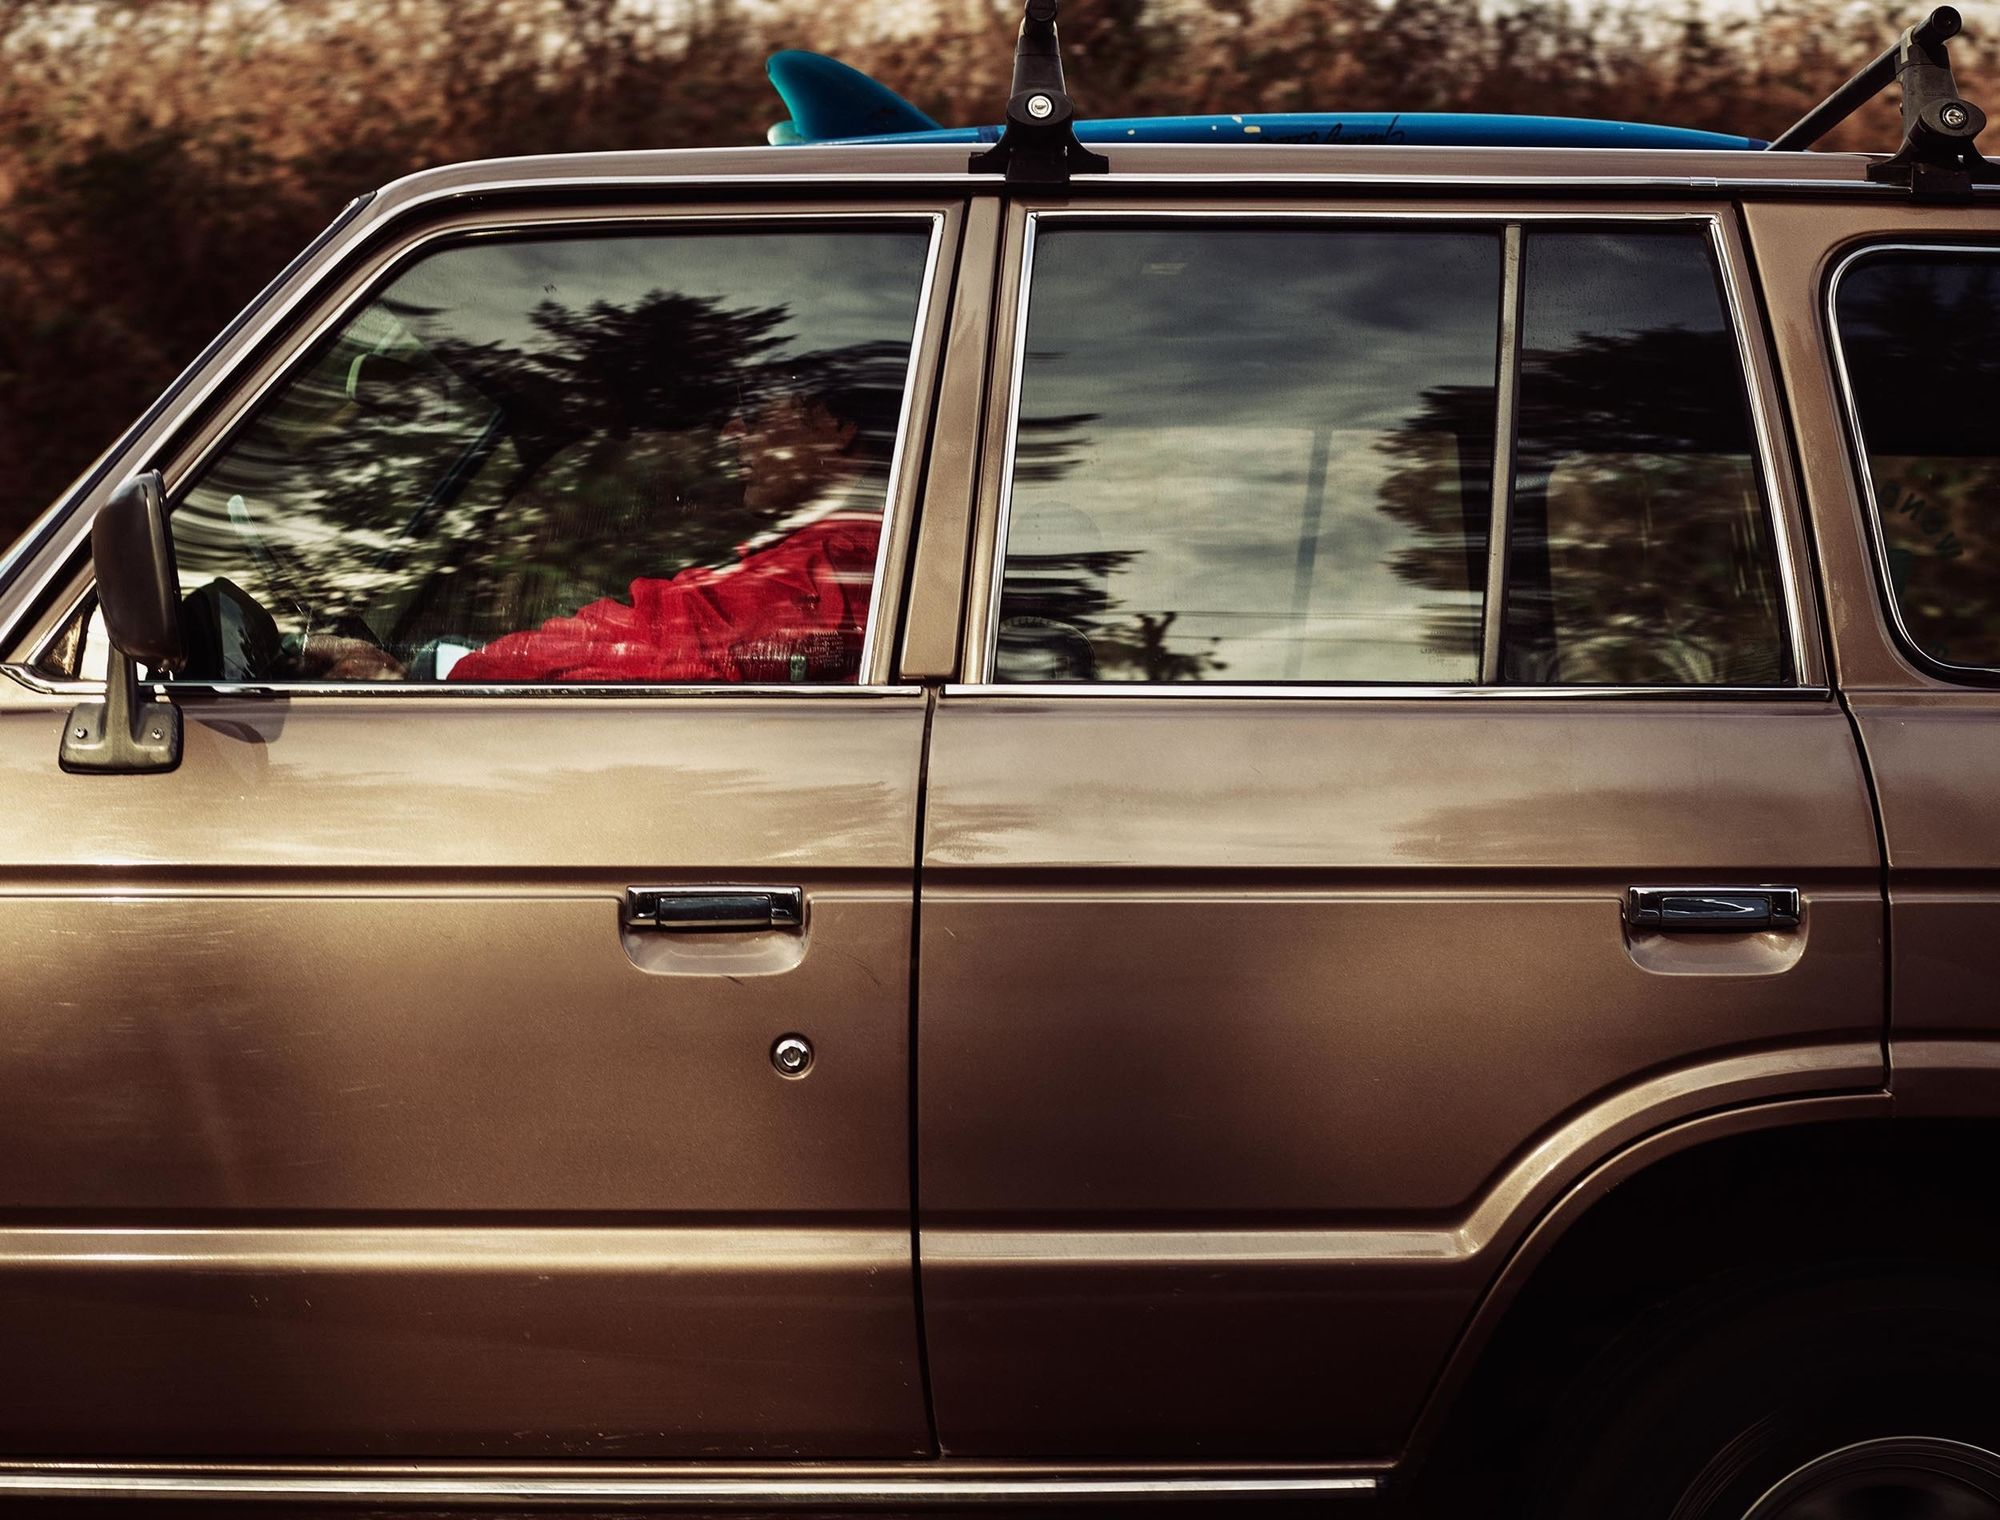 JEFF LUDES shoots a vintage Toyota FJ60 on the Oregon Coast